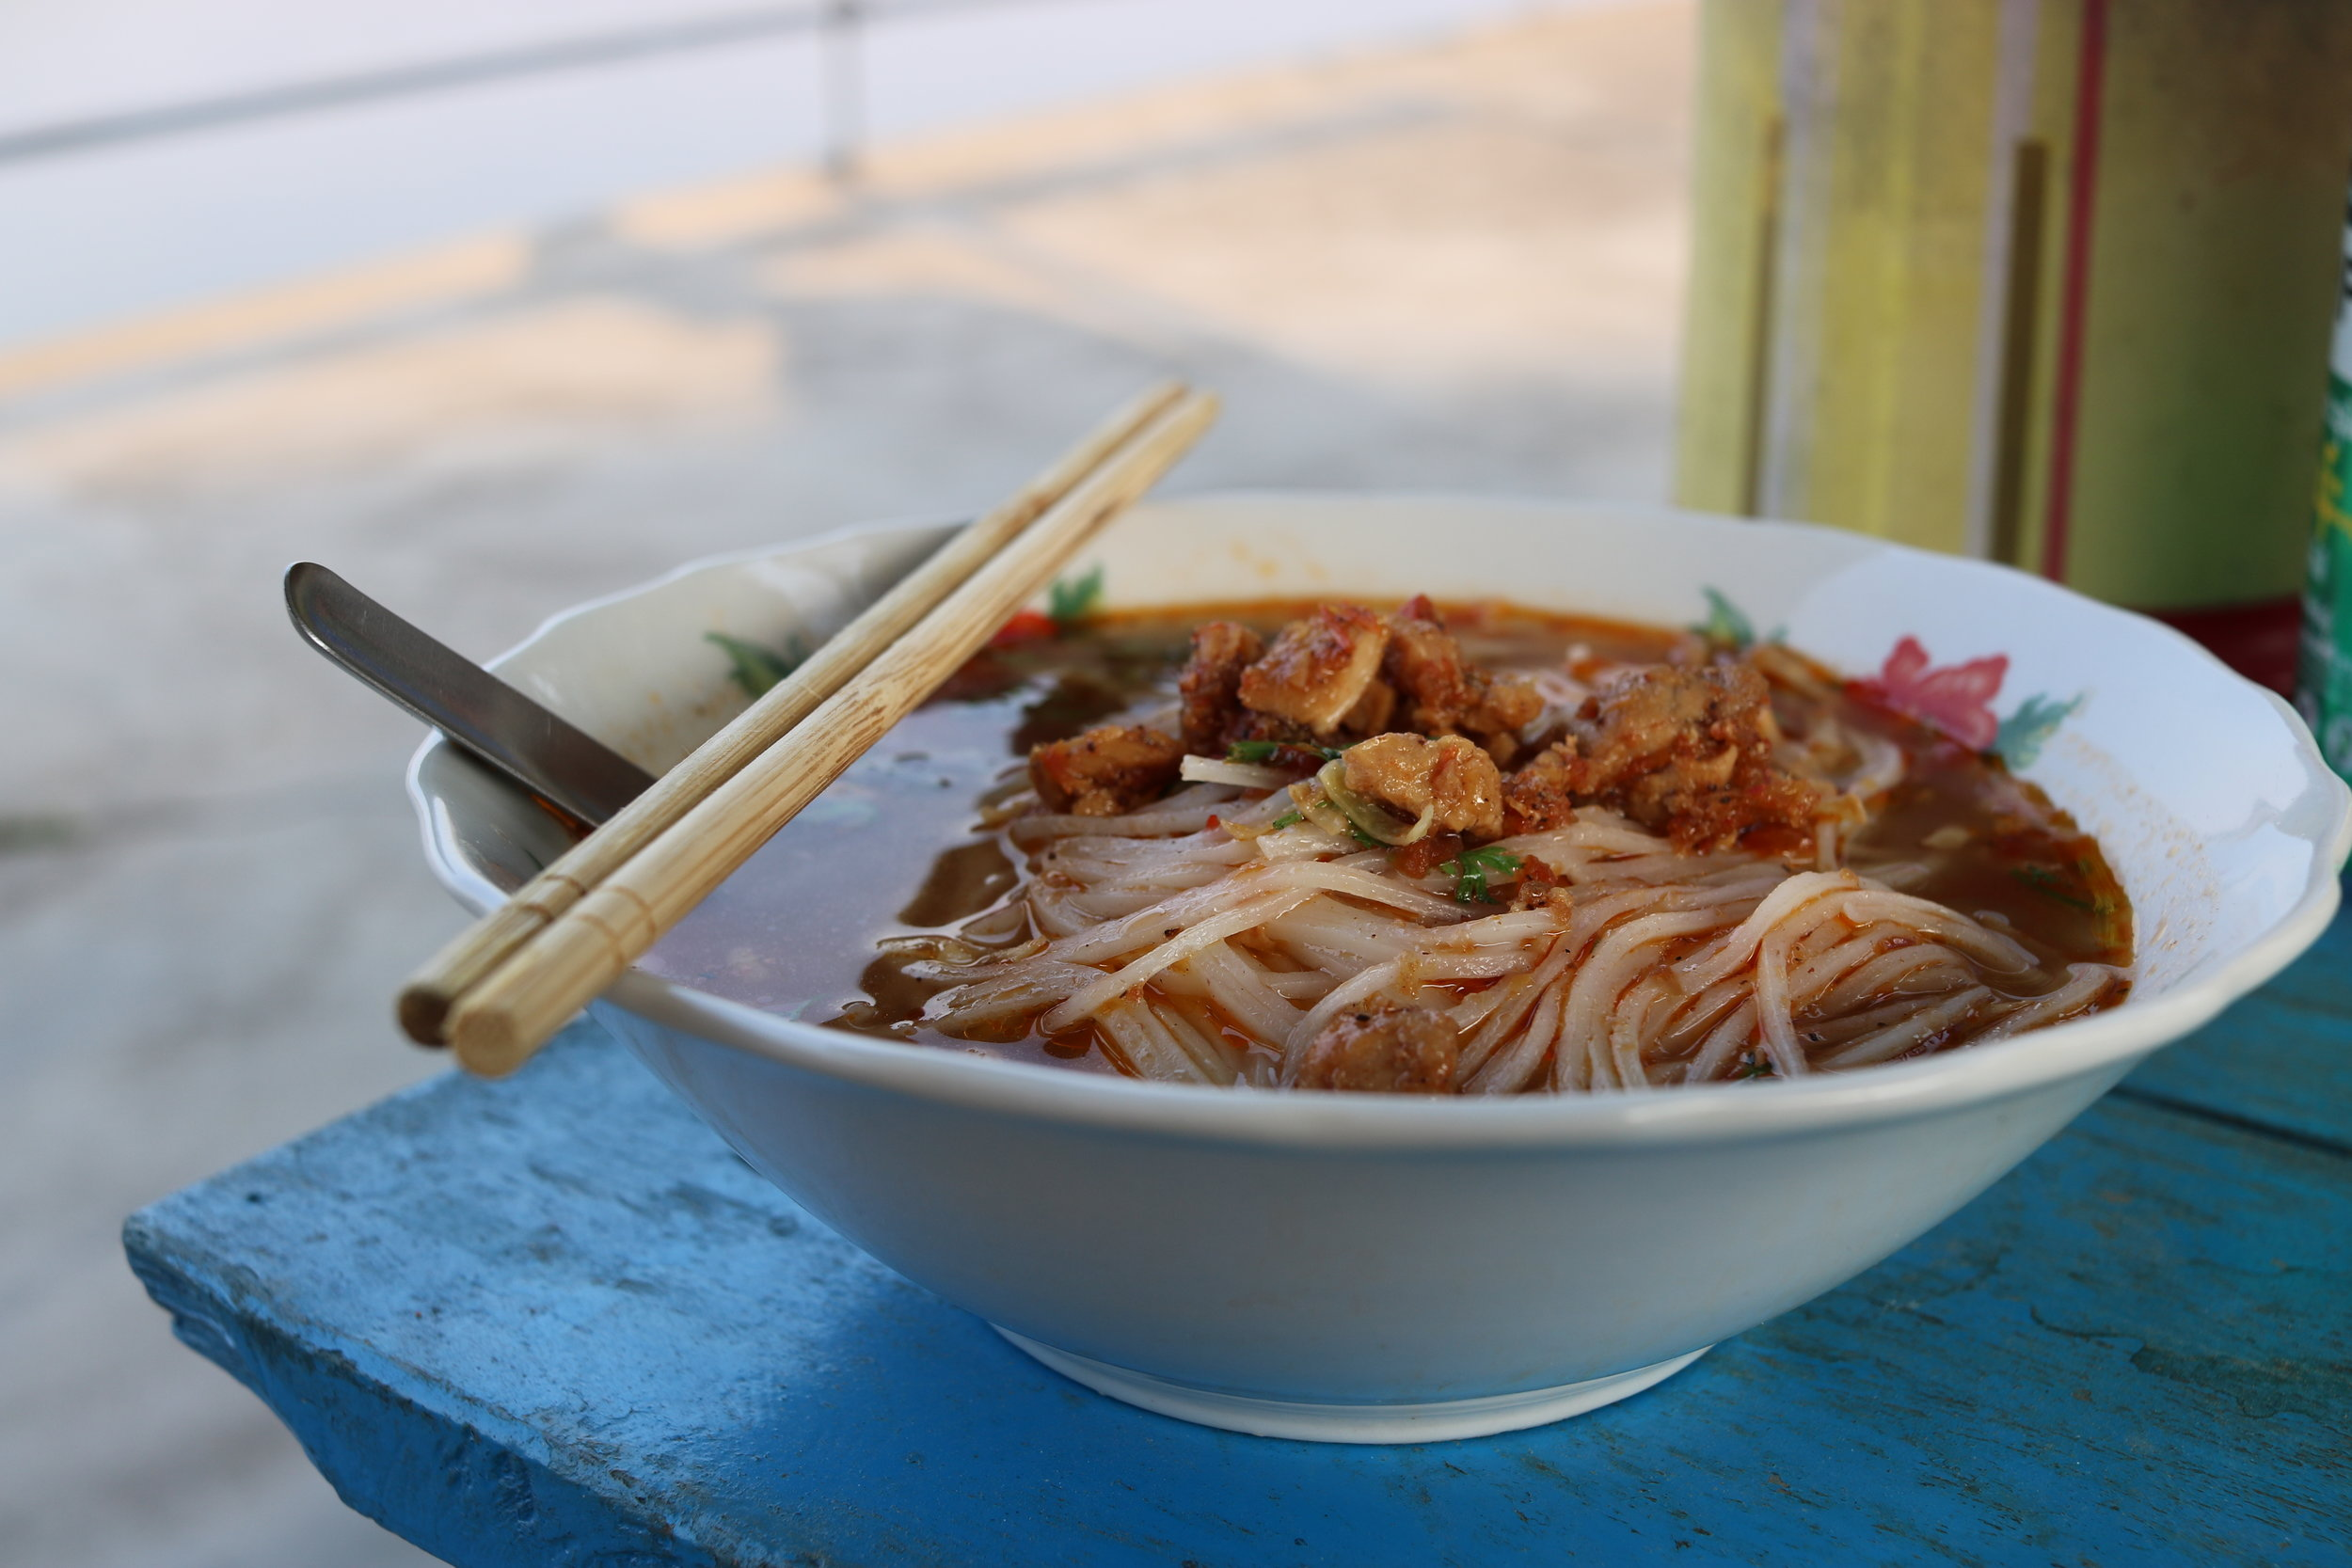 Shan noodle soup at Blackhouse Coffee Shop, Hsipaw, Myanmar @acrosslandsea